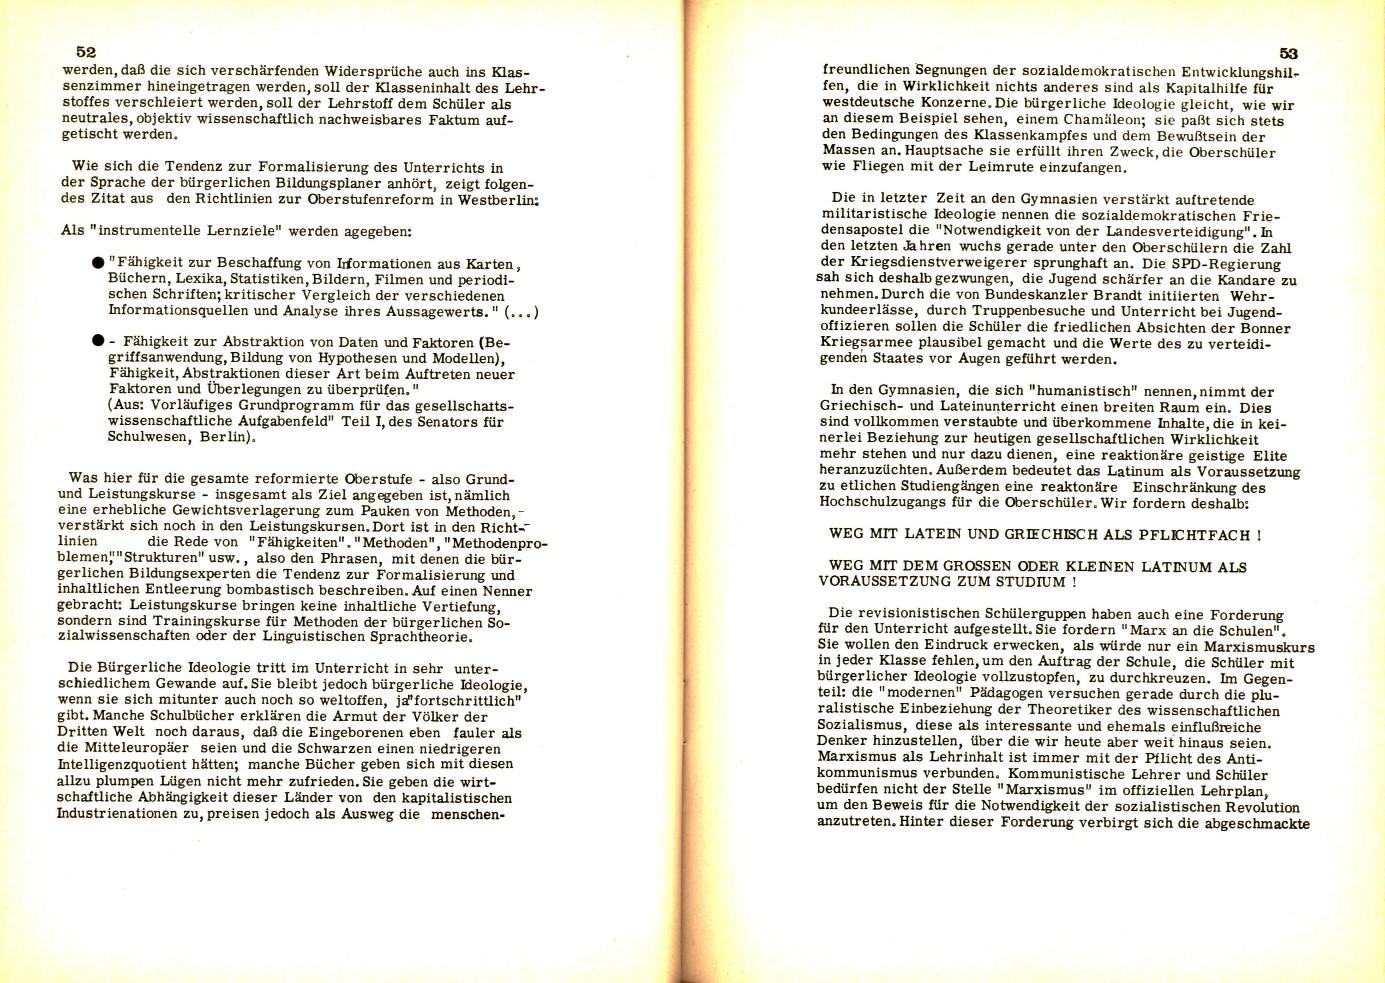 KOV_1973_Aktionsprogramm_29